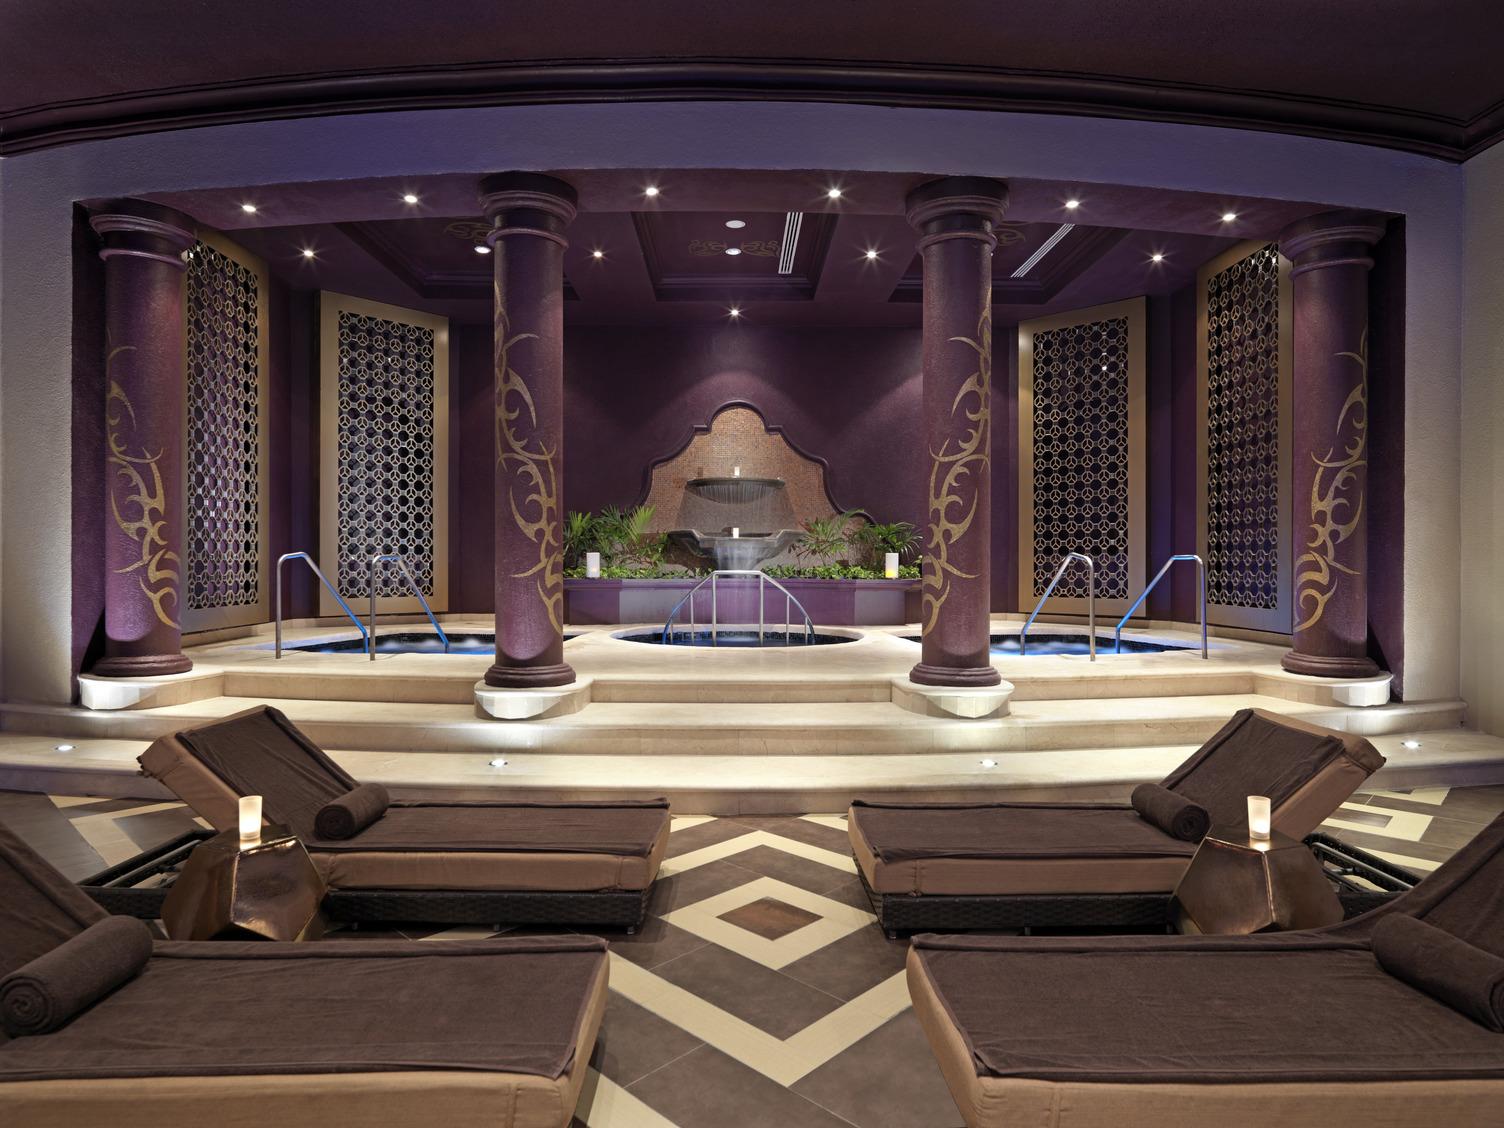 Travel Agency All-Inclusive Resort Heaven at Hard Rock Hotel Riviera Maya 59